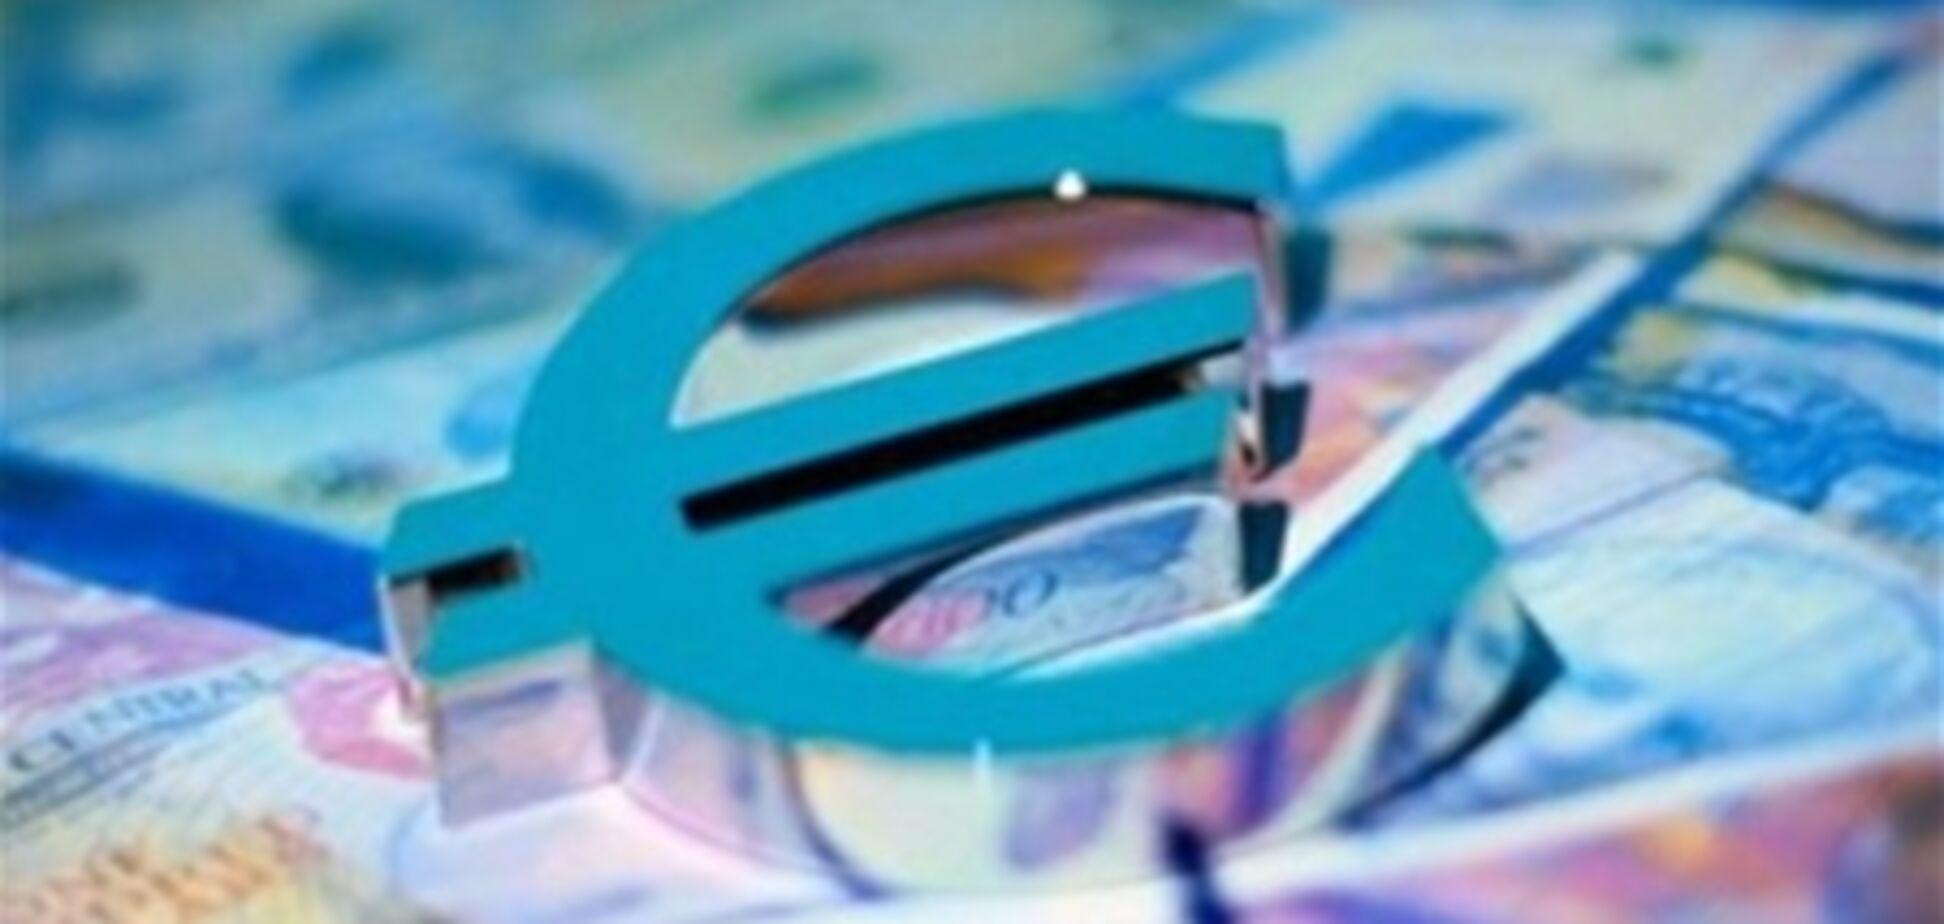 Евро в Украине подешевел, 28 марта 2012